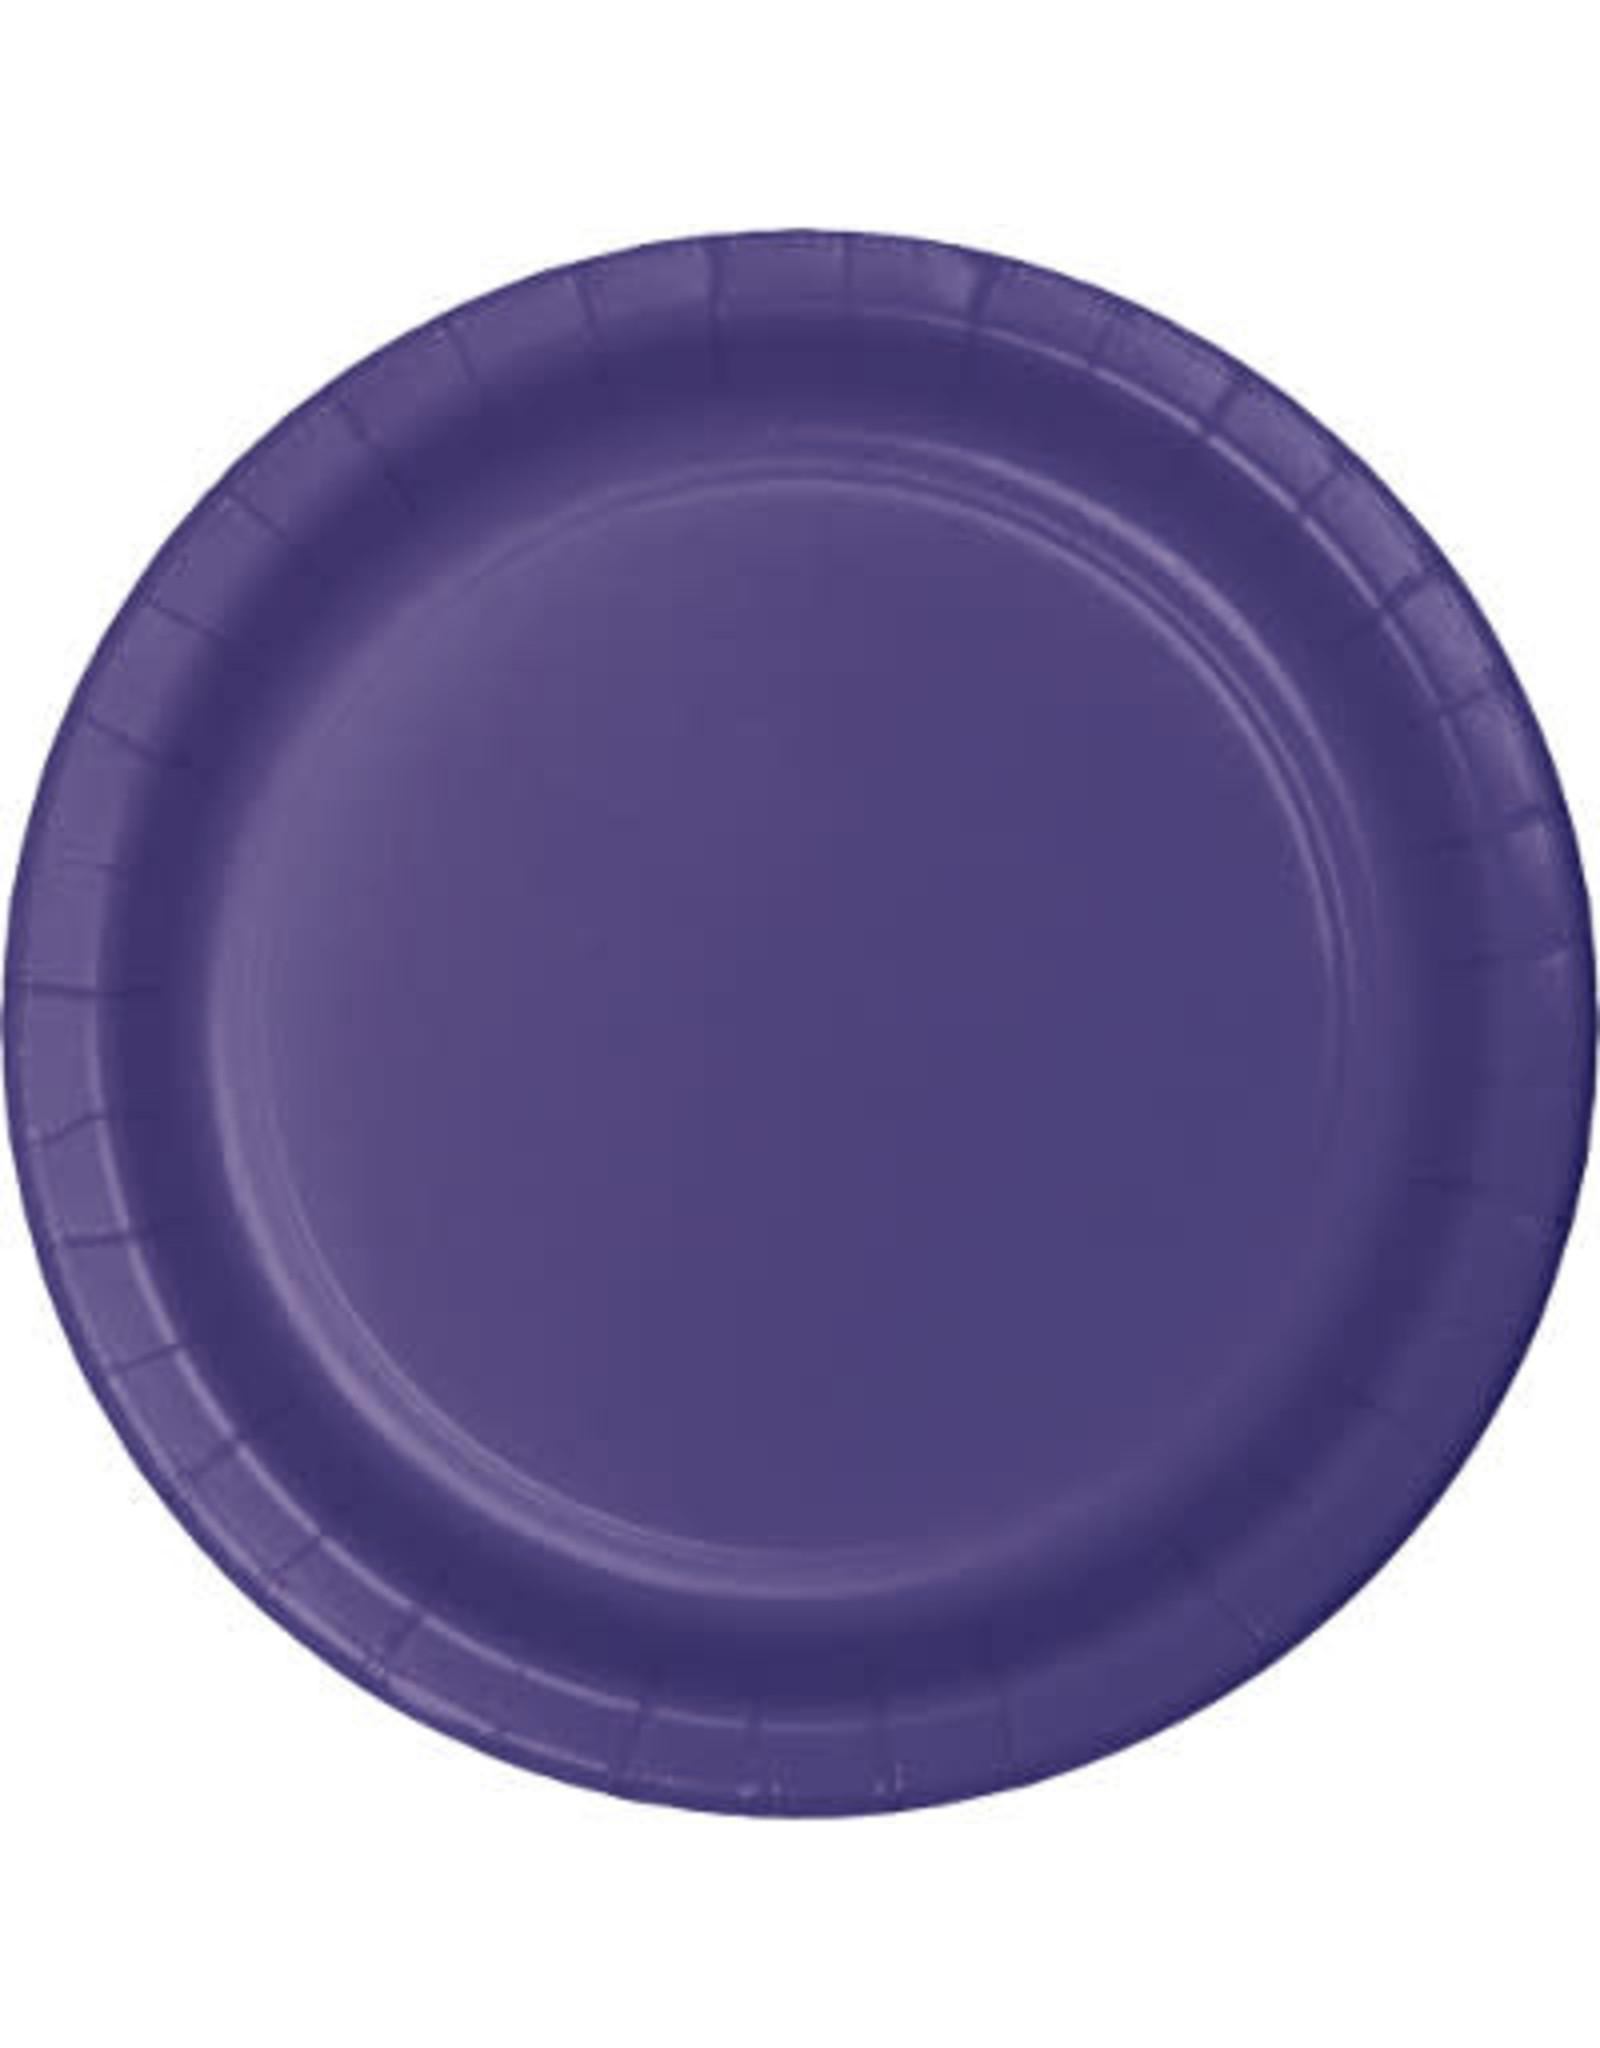 "Touch of Color 10"" Purple Paper Banquet Plates - 24ct."